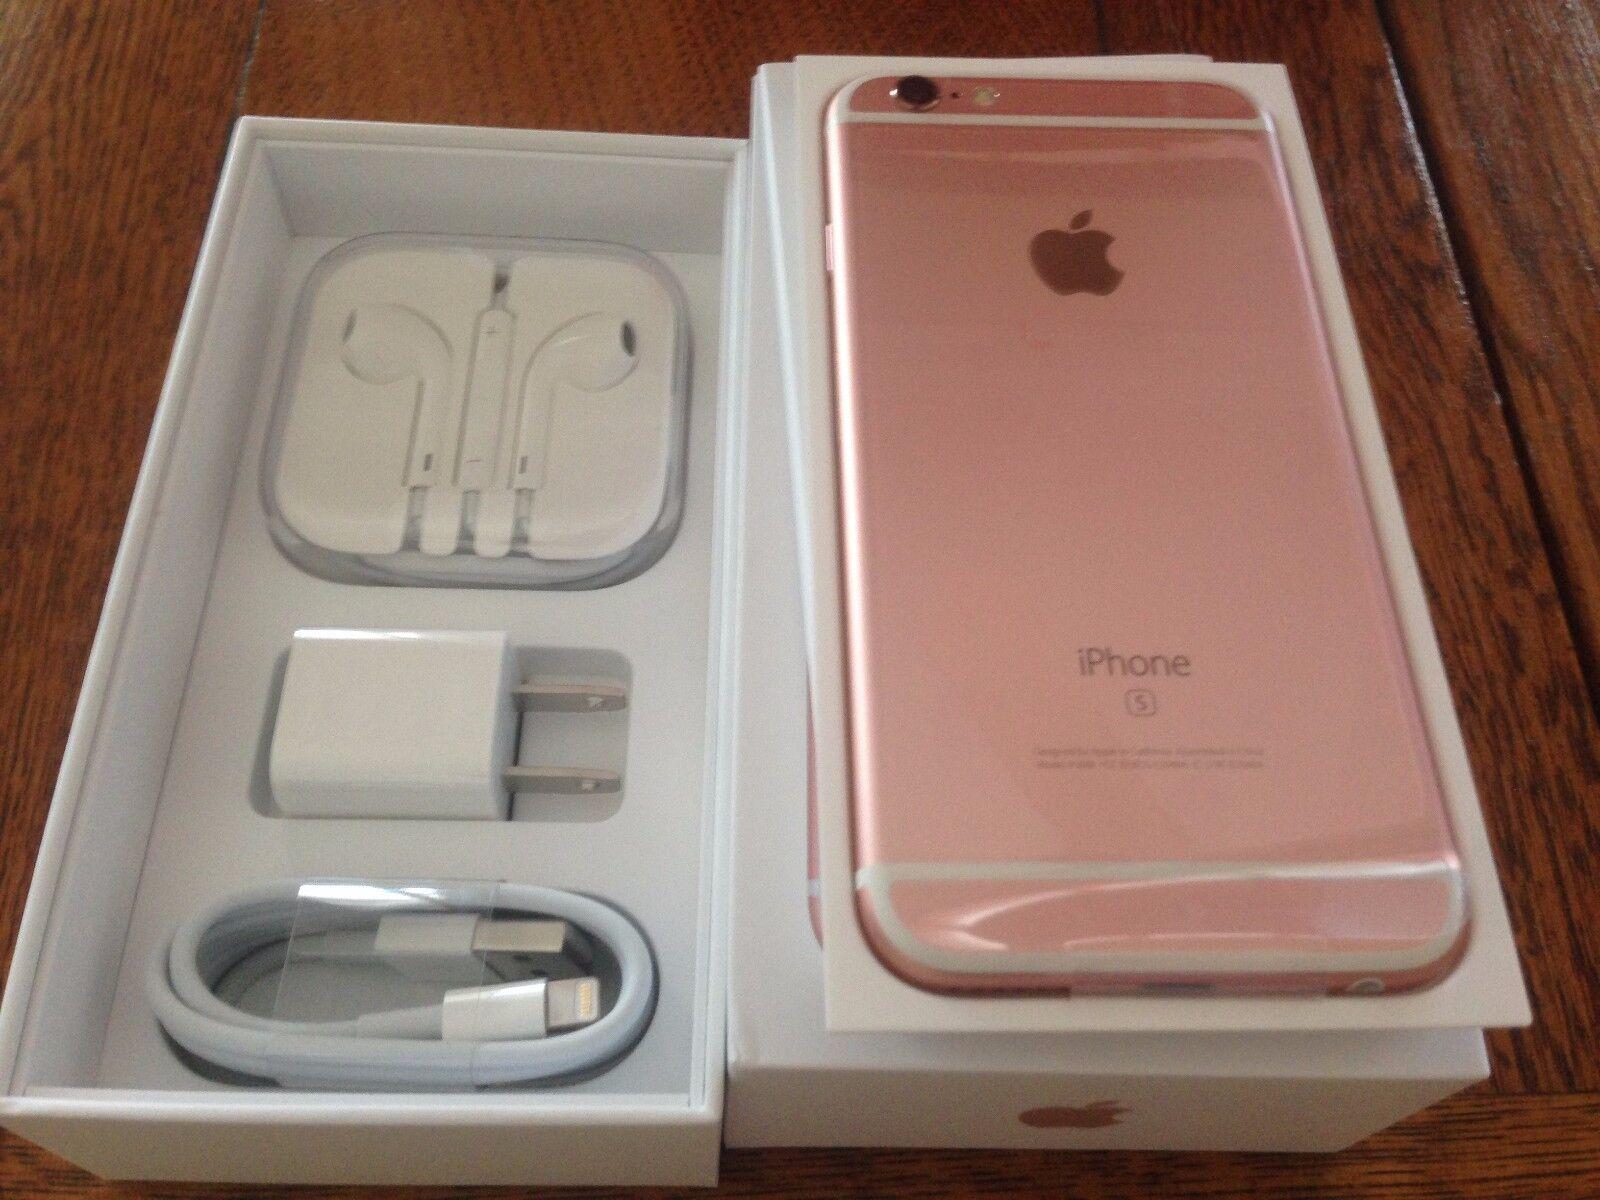 reputable site 8e2f3 00e08 Ebay NEW Rose Gold Space Gray iPhone 6S 128GB Factory UNLOCKED TMobile  Straight Talk